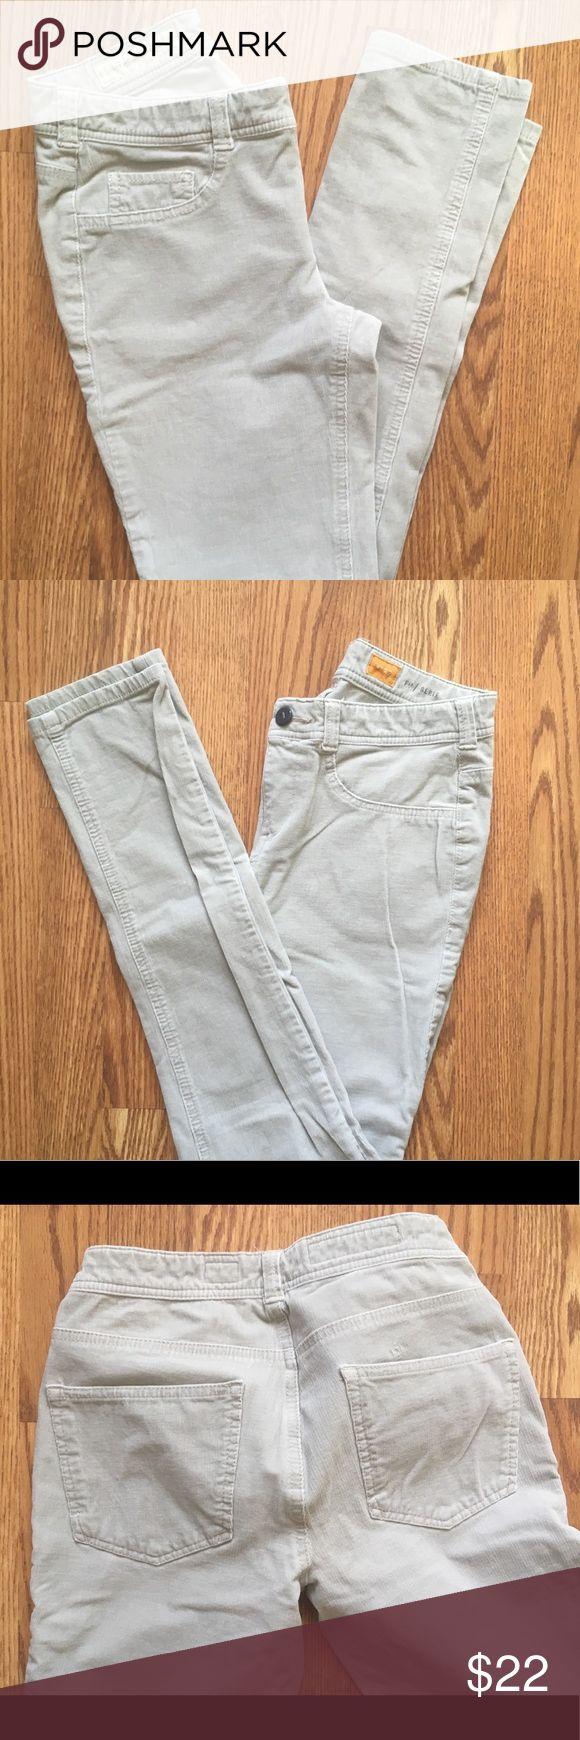 Corduroy Leggings Khaki corduroy leggings from Anthropologie, 97% cotton, 3% Spandex Anthropologie Pants Leggings